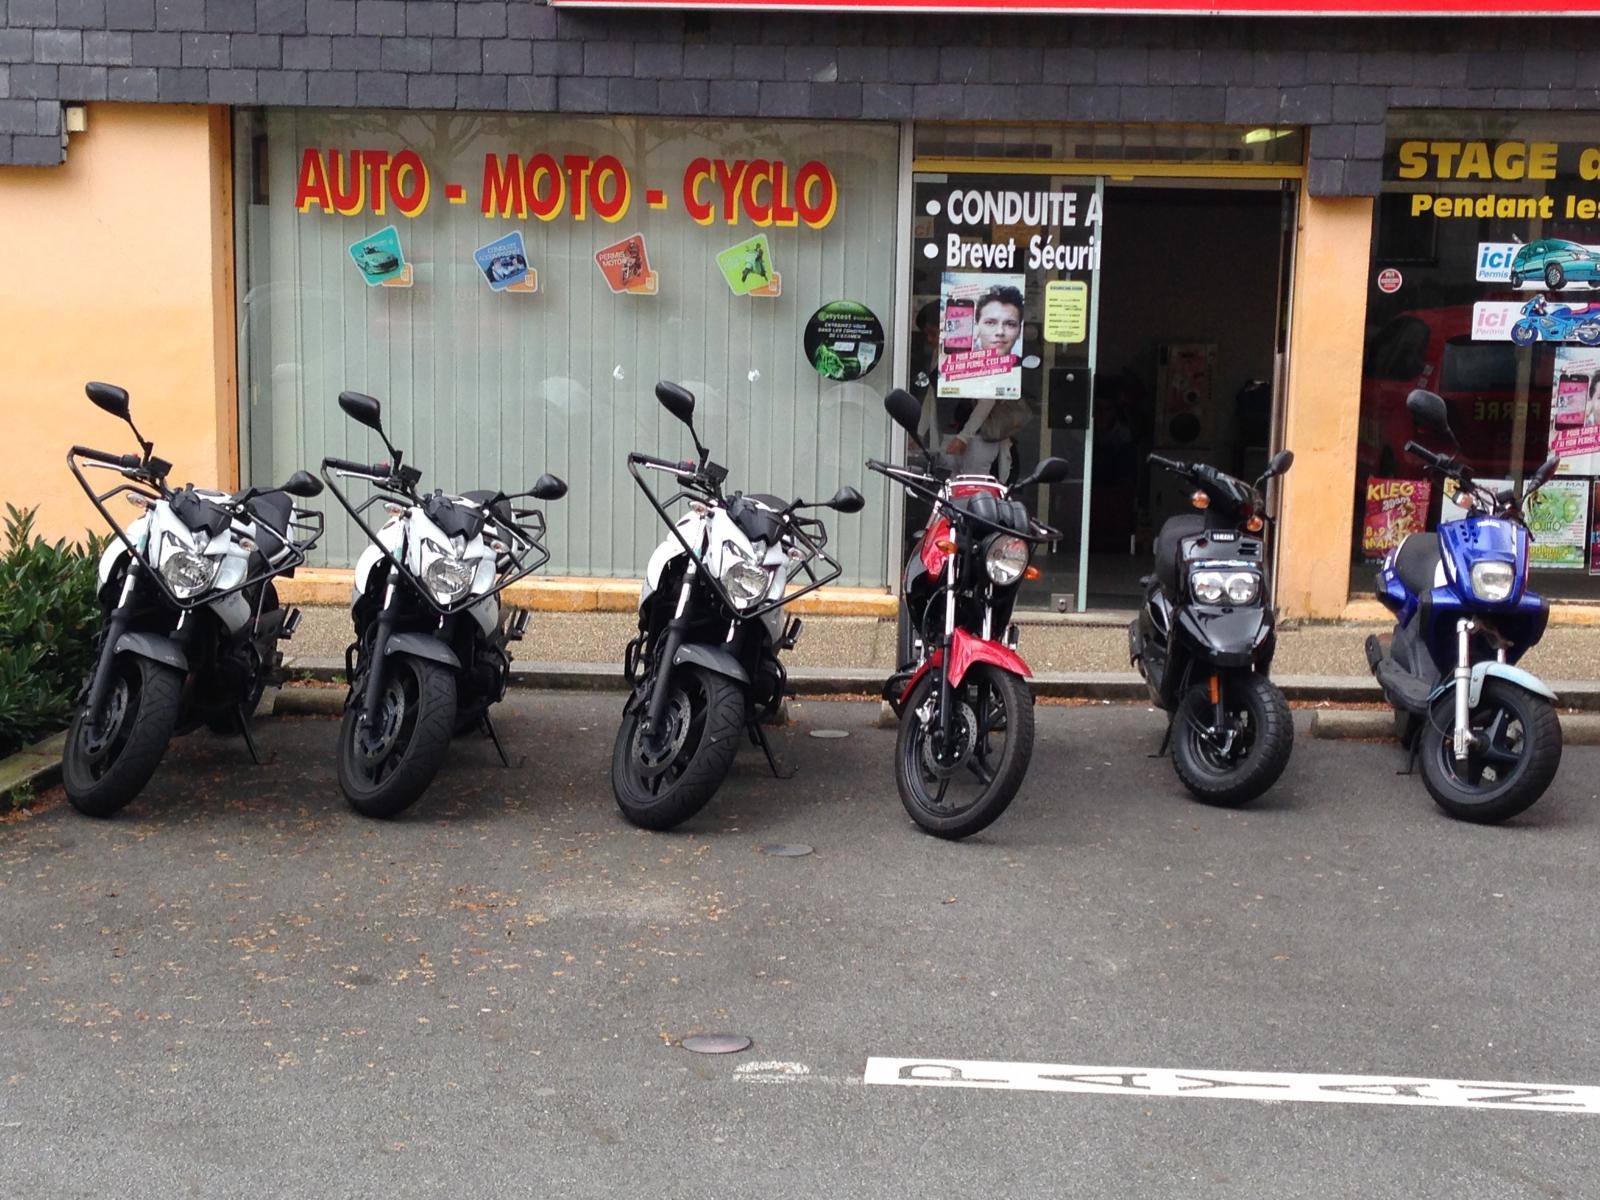 moto sans permis archives page 14 of 15 moto plein phare. Black Bedroom Furniture Sets. Home Design Ideas